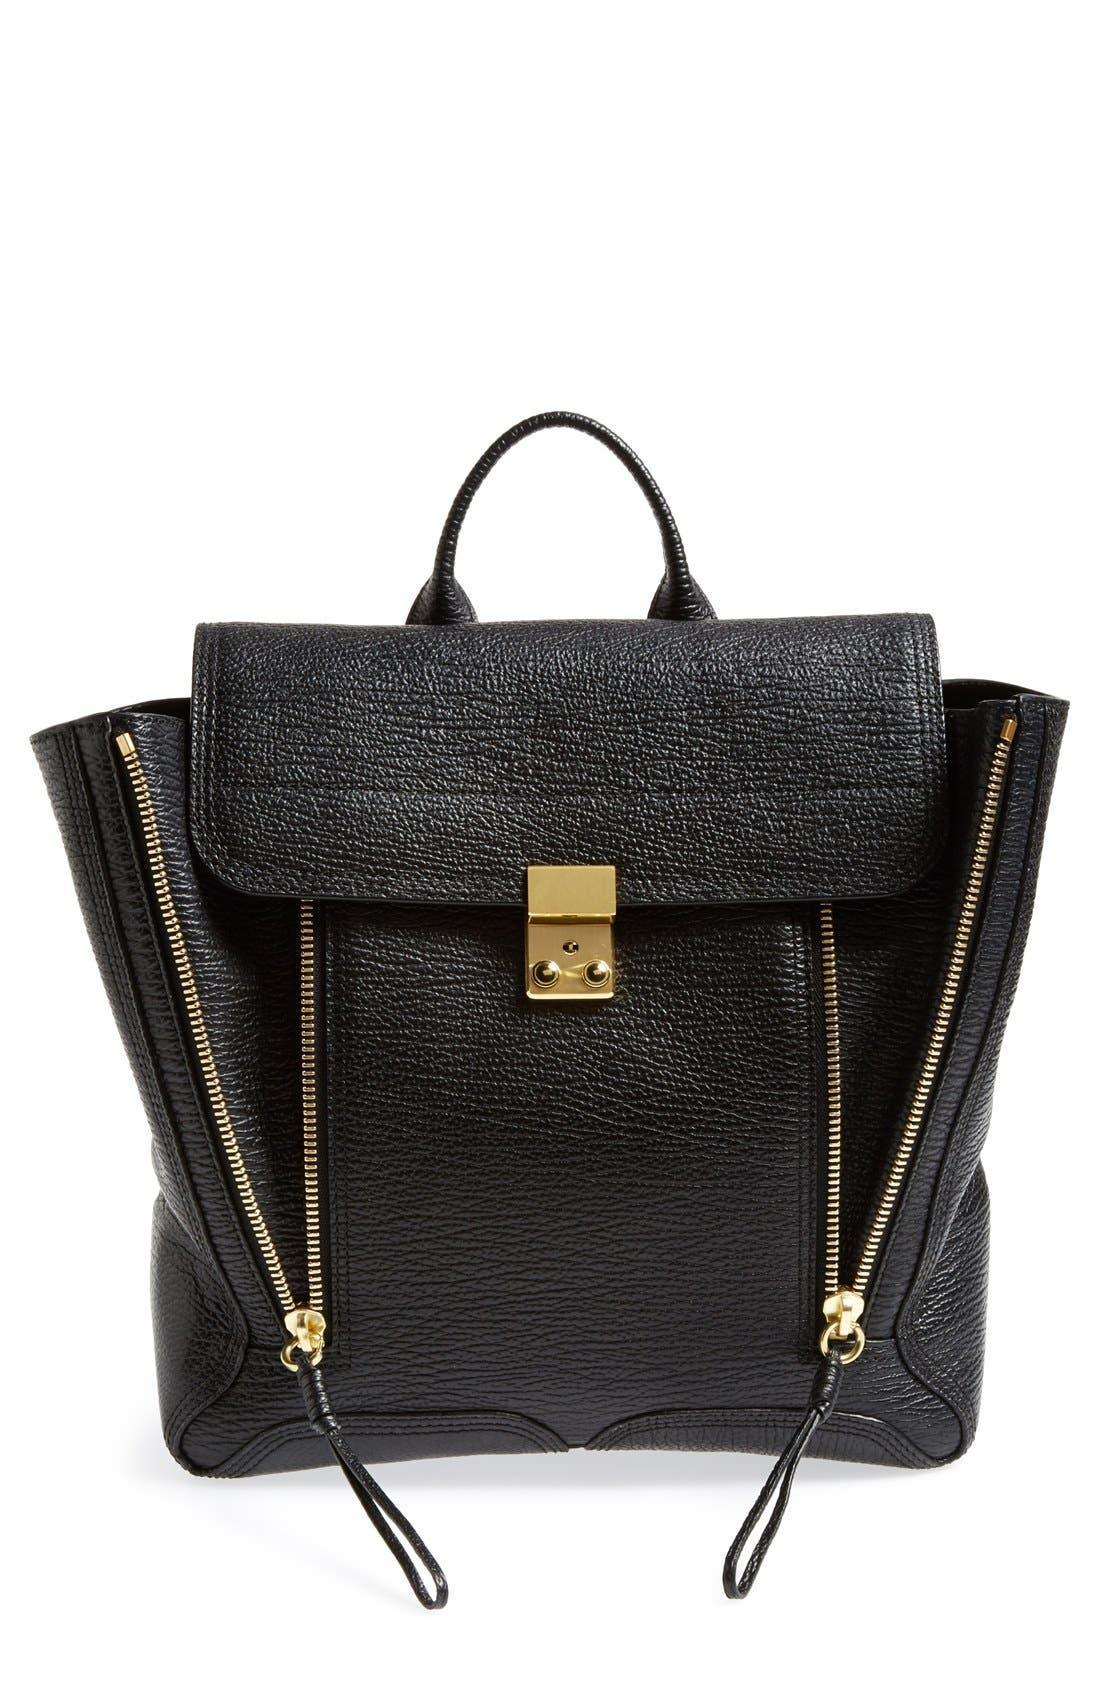 Alternate Image 1 Selected - 3.1 Phillip Lim 'Pashli' Leather Backpack